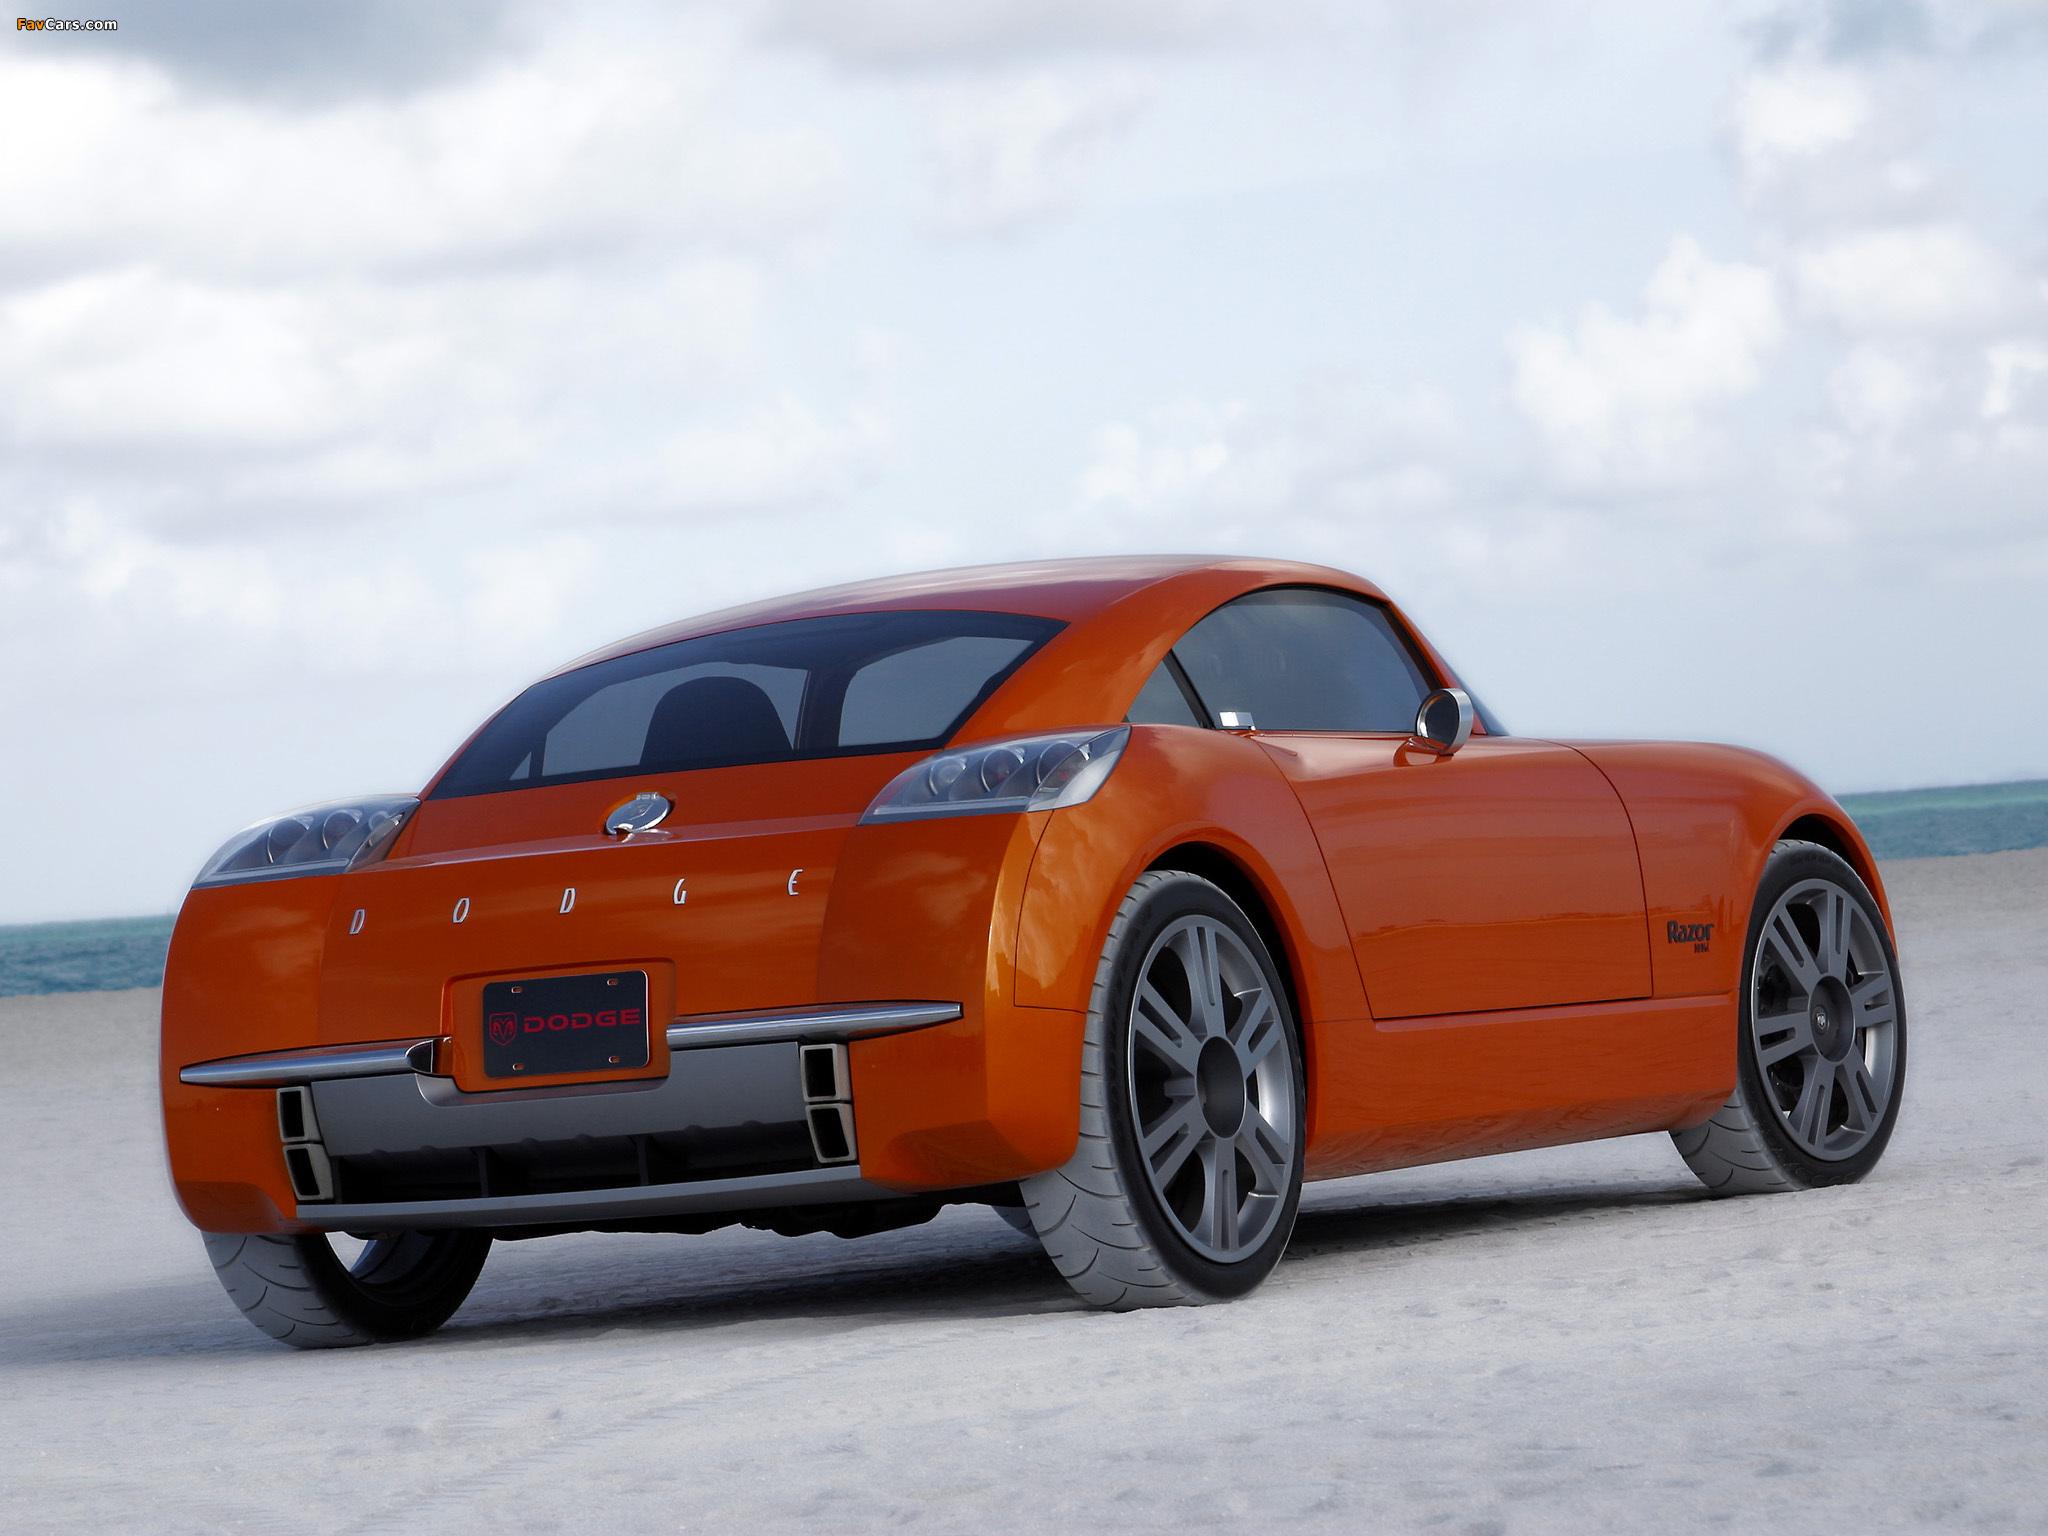 Dodge Razor Concept 2002 pictures (2048 x 1536)